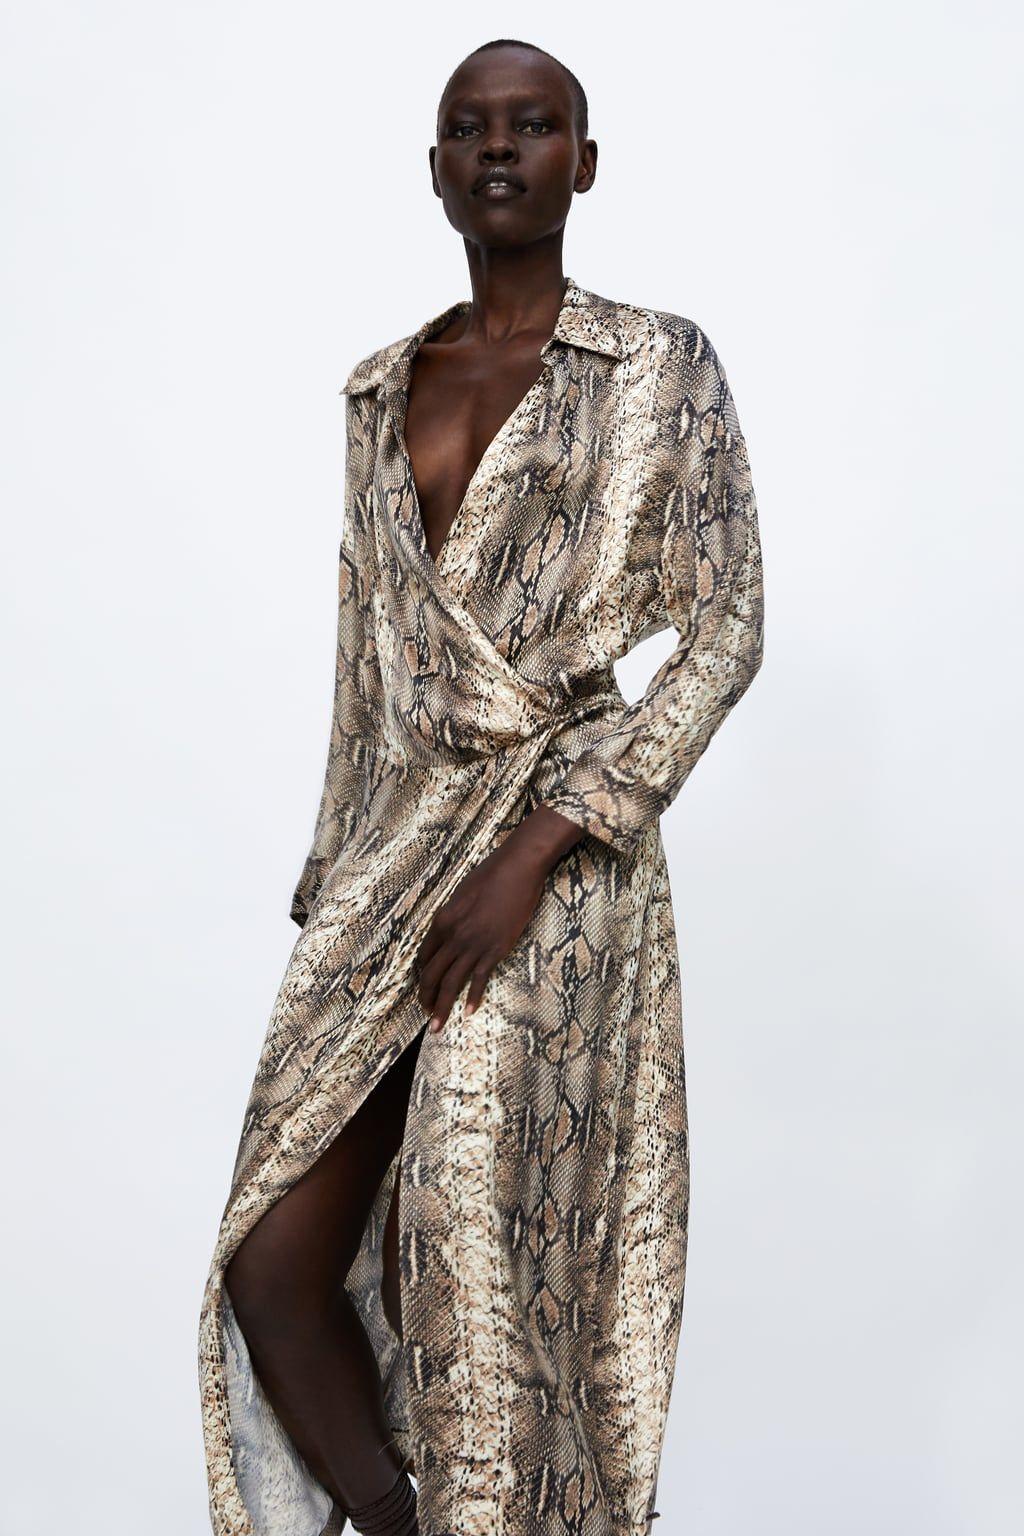 9337b0bdea201c Image 2 of SNAKESKIN PRINTED SHIRT DRESS from Zara | Lookbook in ...